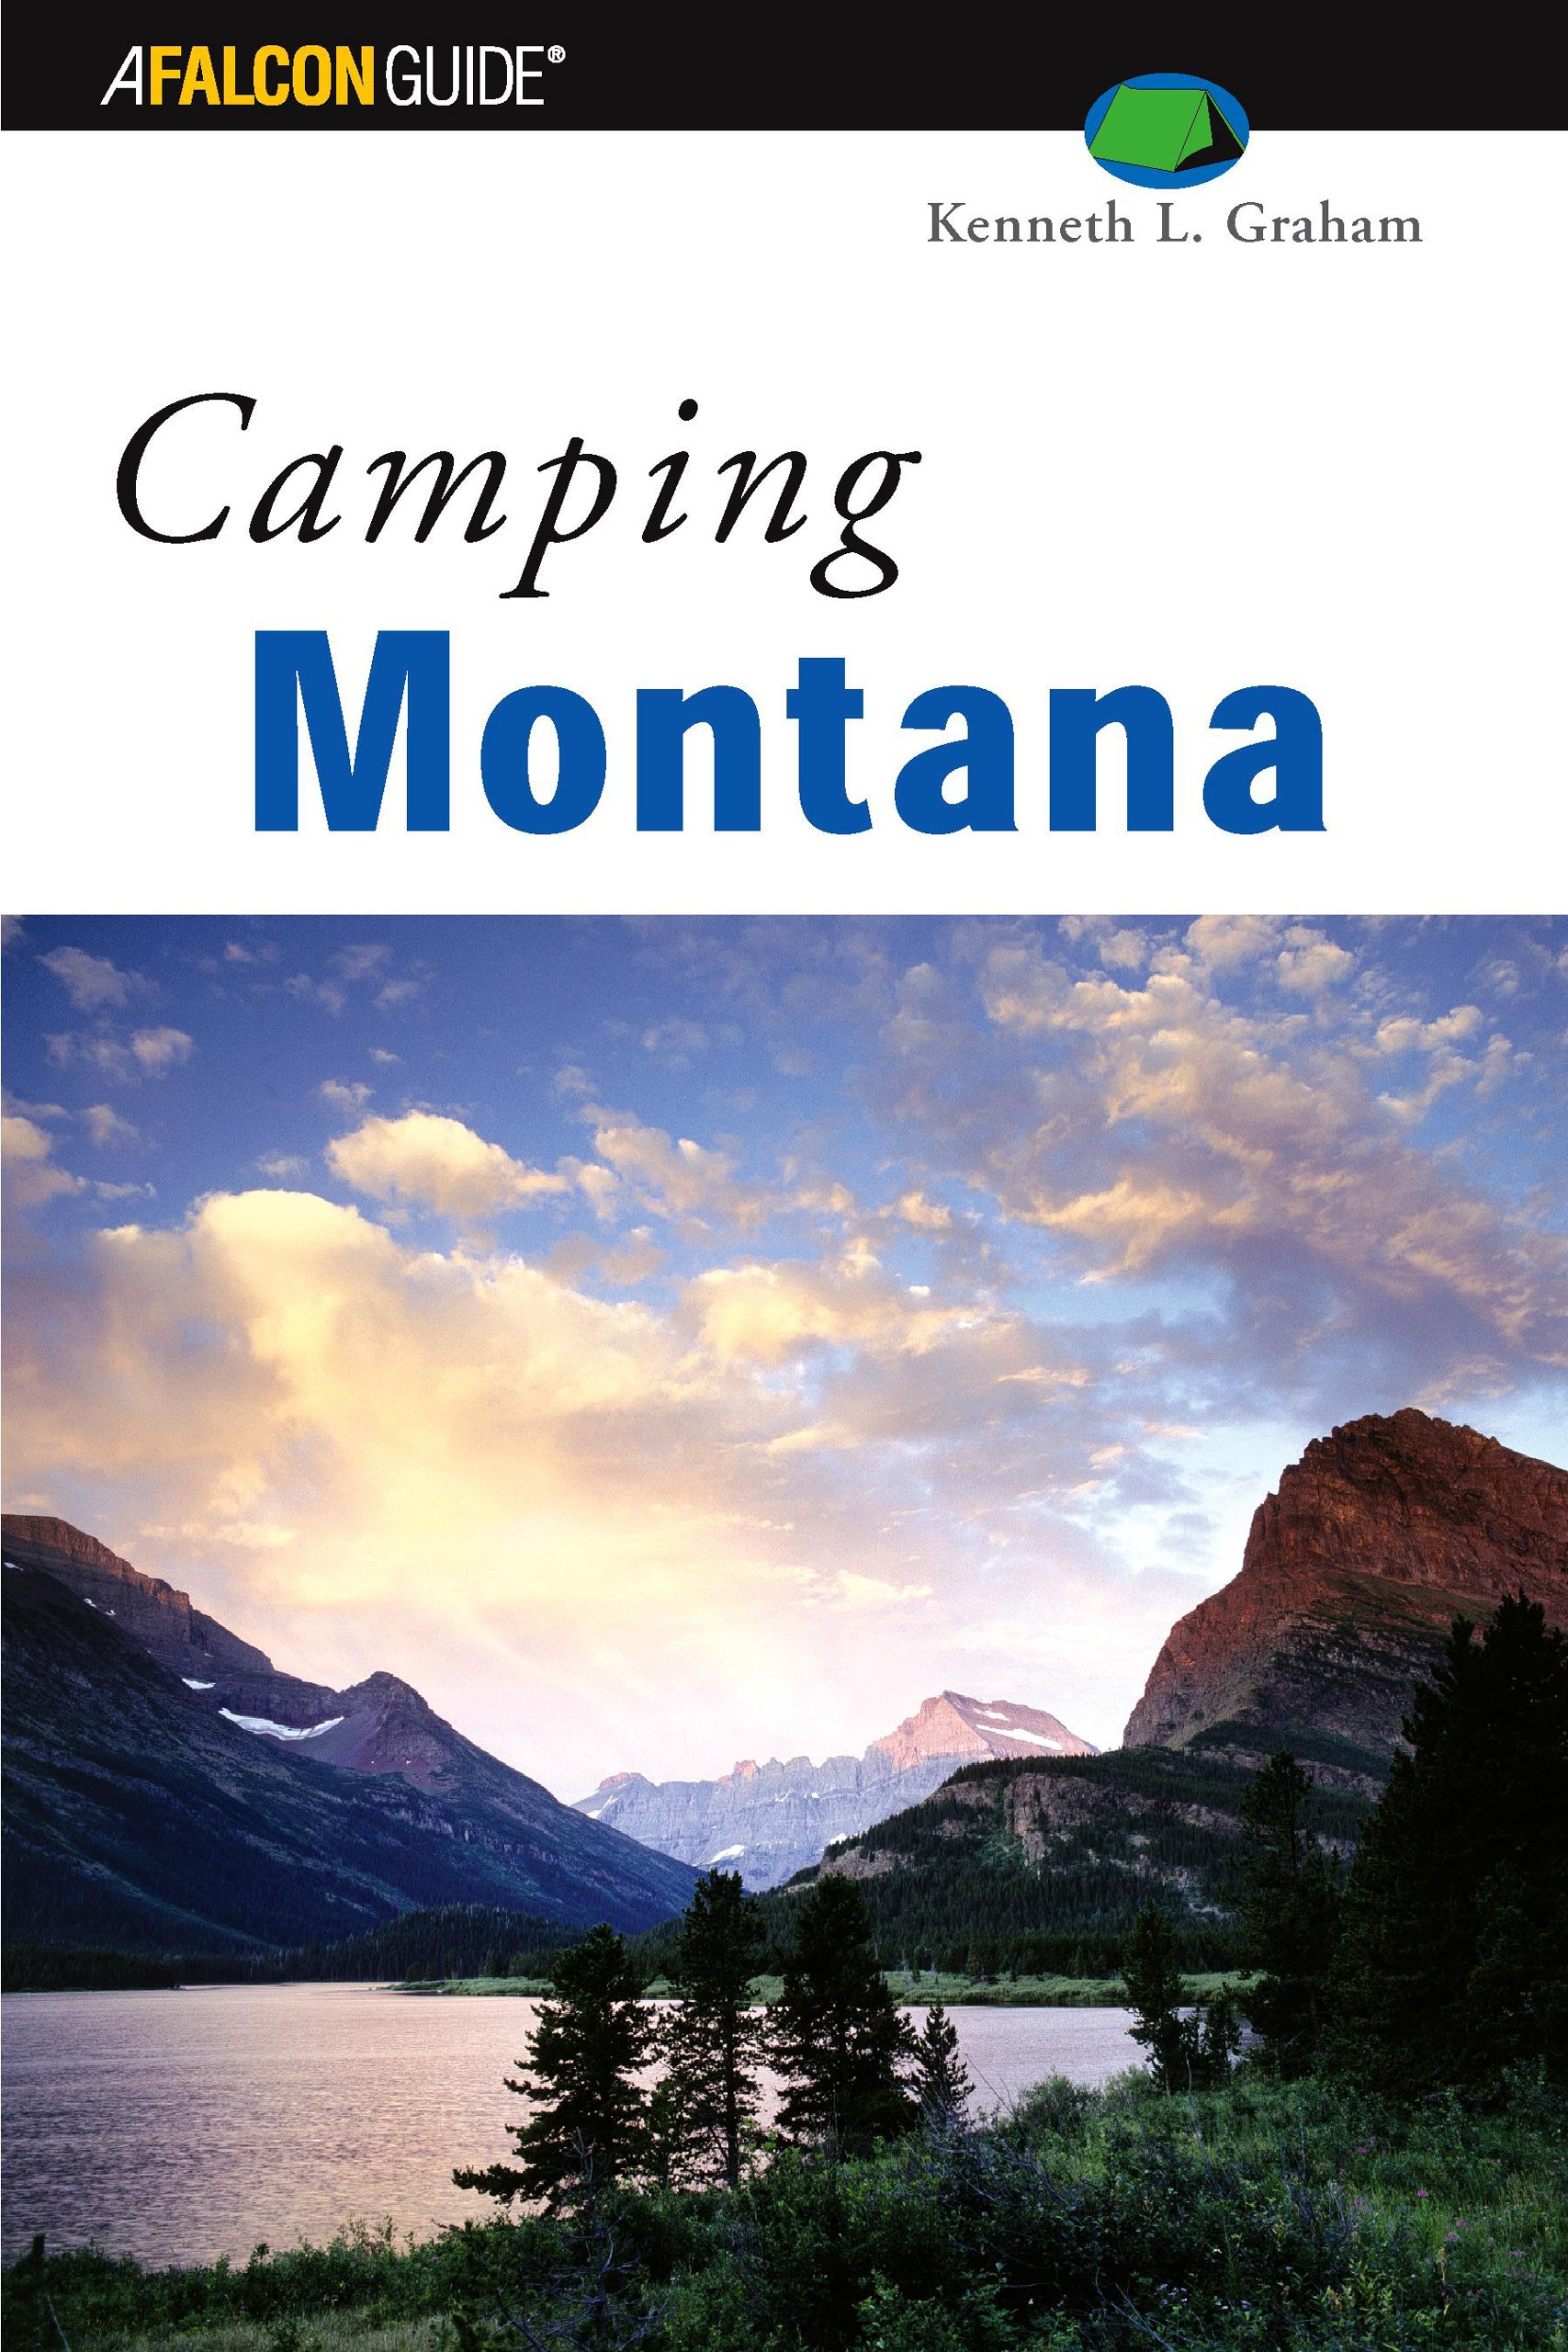 Camping Montana (Regional Camping Series): Kenneth Graham: 9780762710782:  Amazon.com: Books